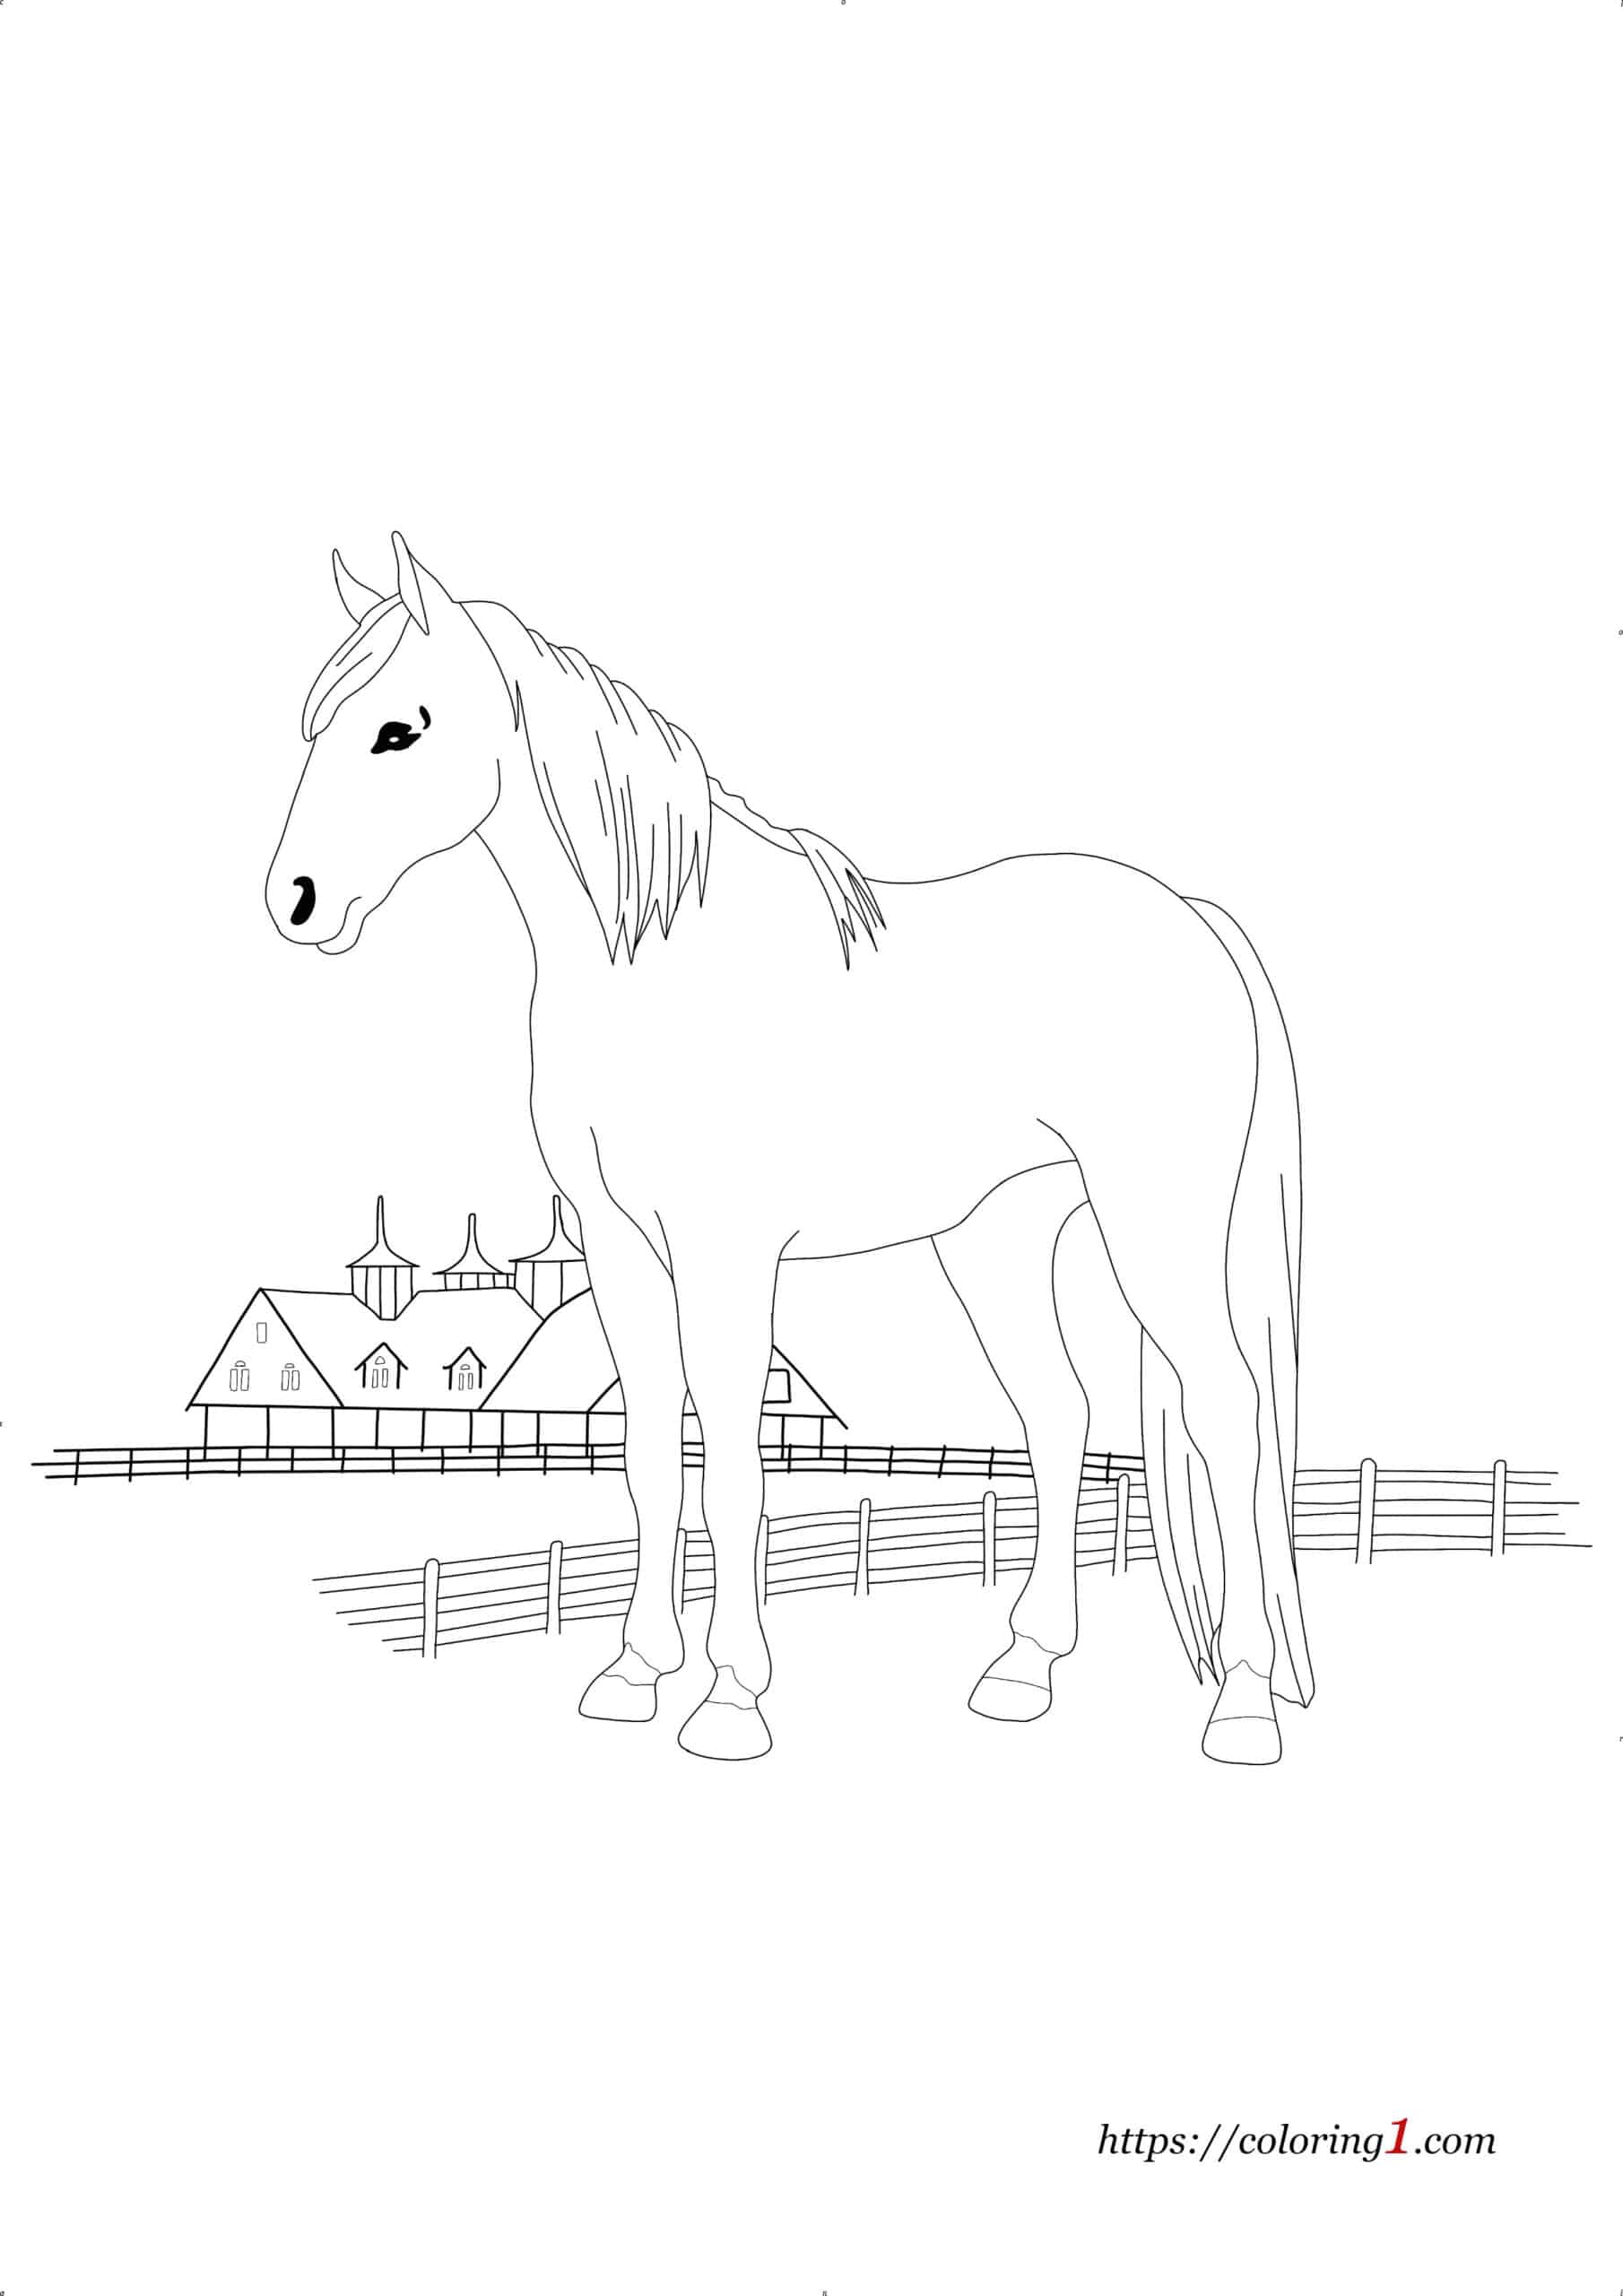 Quarter Horse coloring page